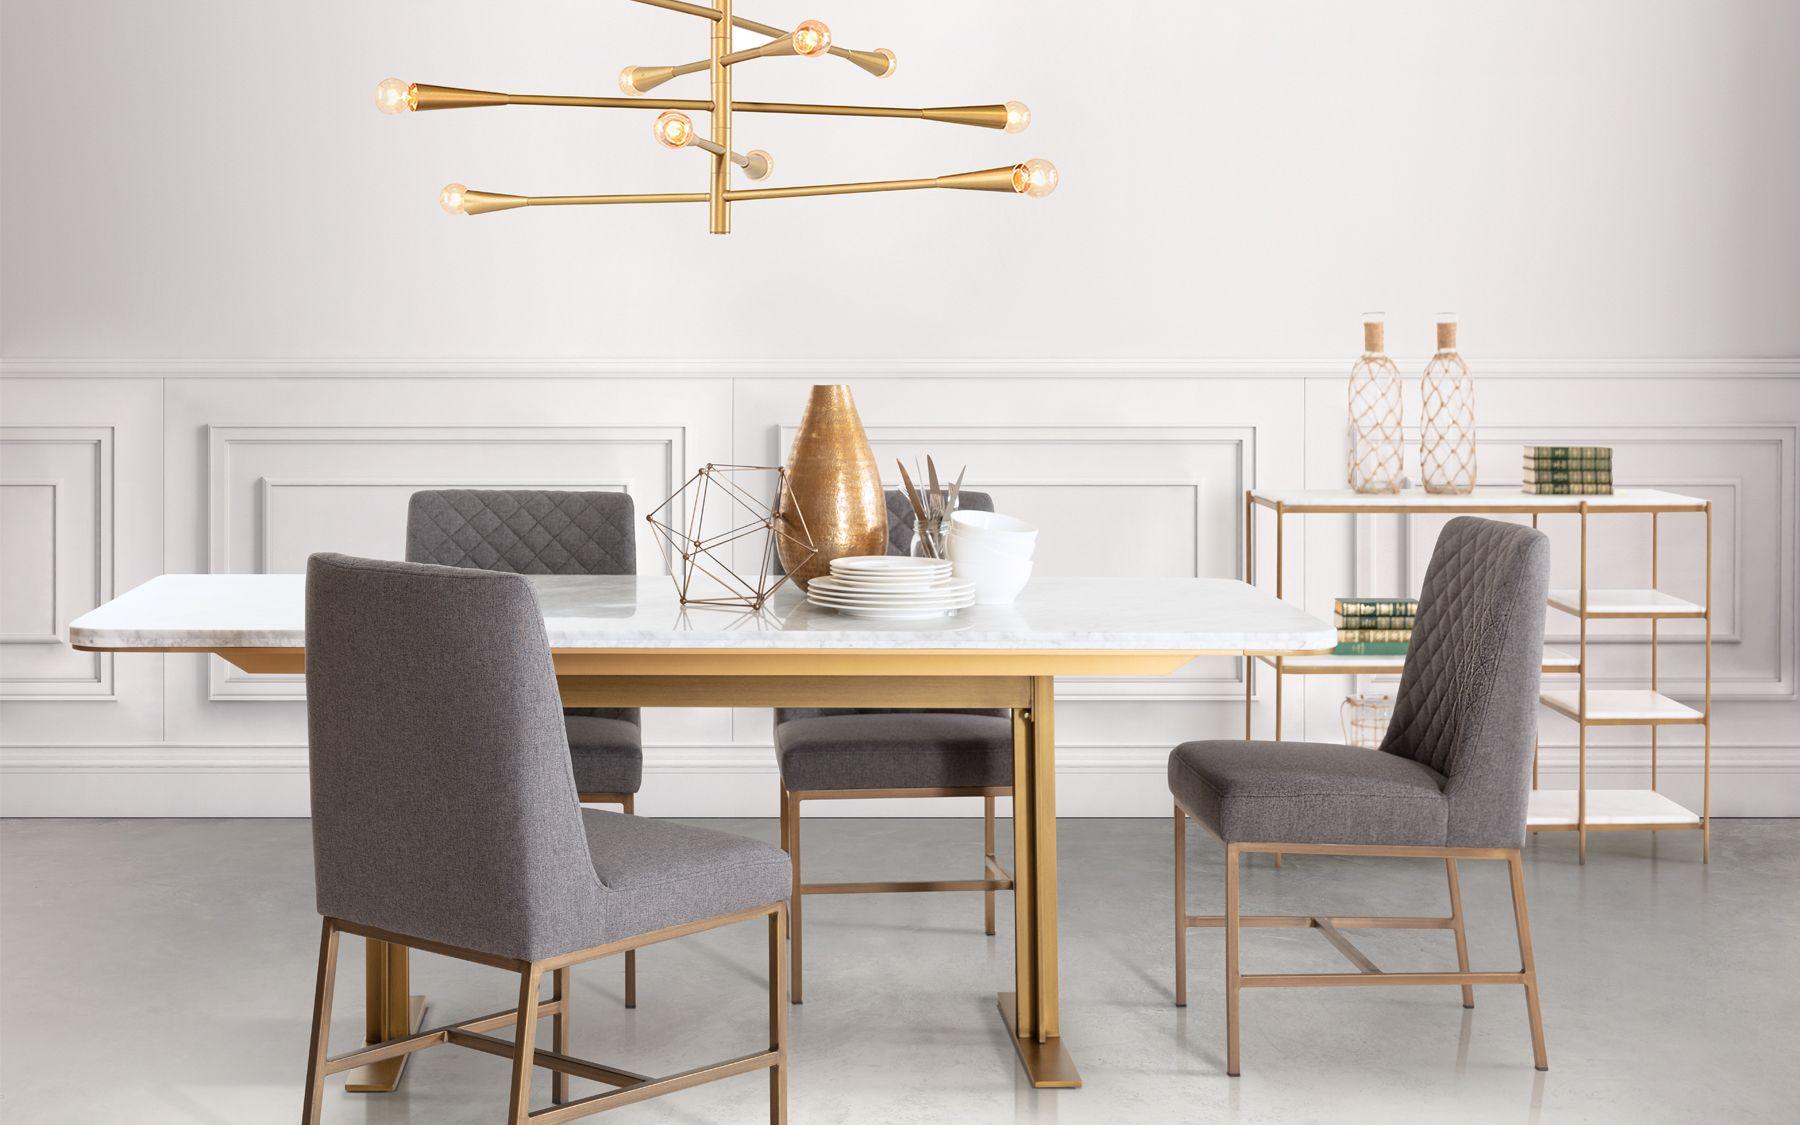 3 Rivieres Table Et Chaises Table Salle A Manger Table Et